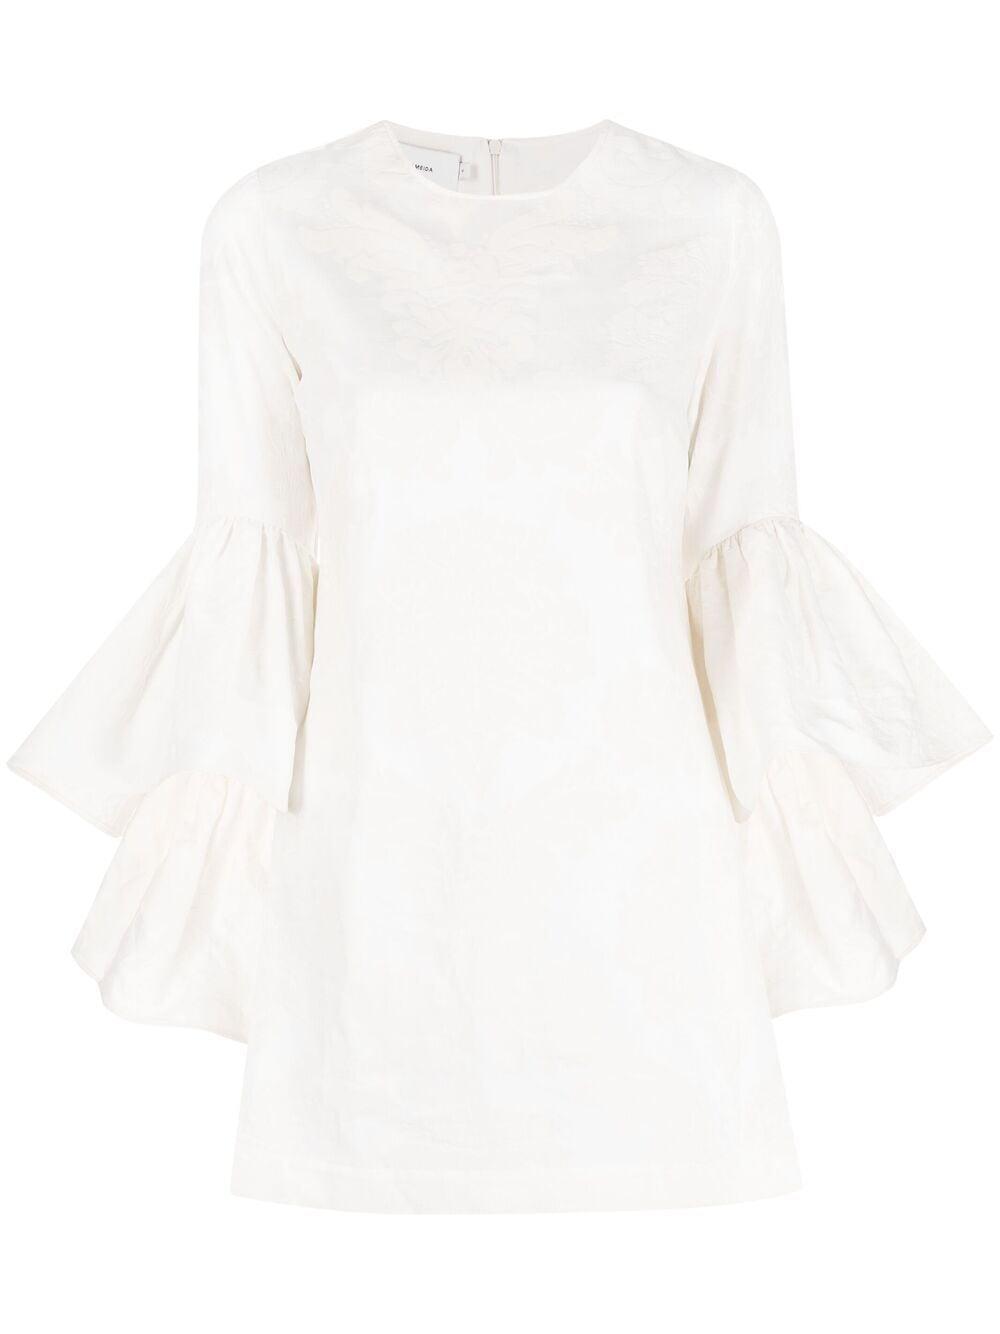 MARQUES ALMEIDA   Dress   DR0042BRCBEIGE